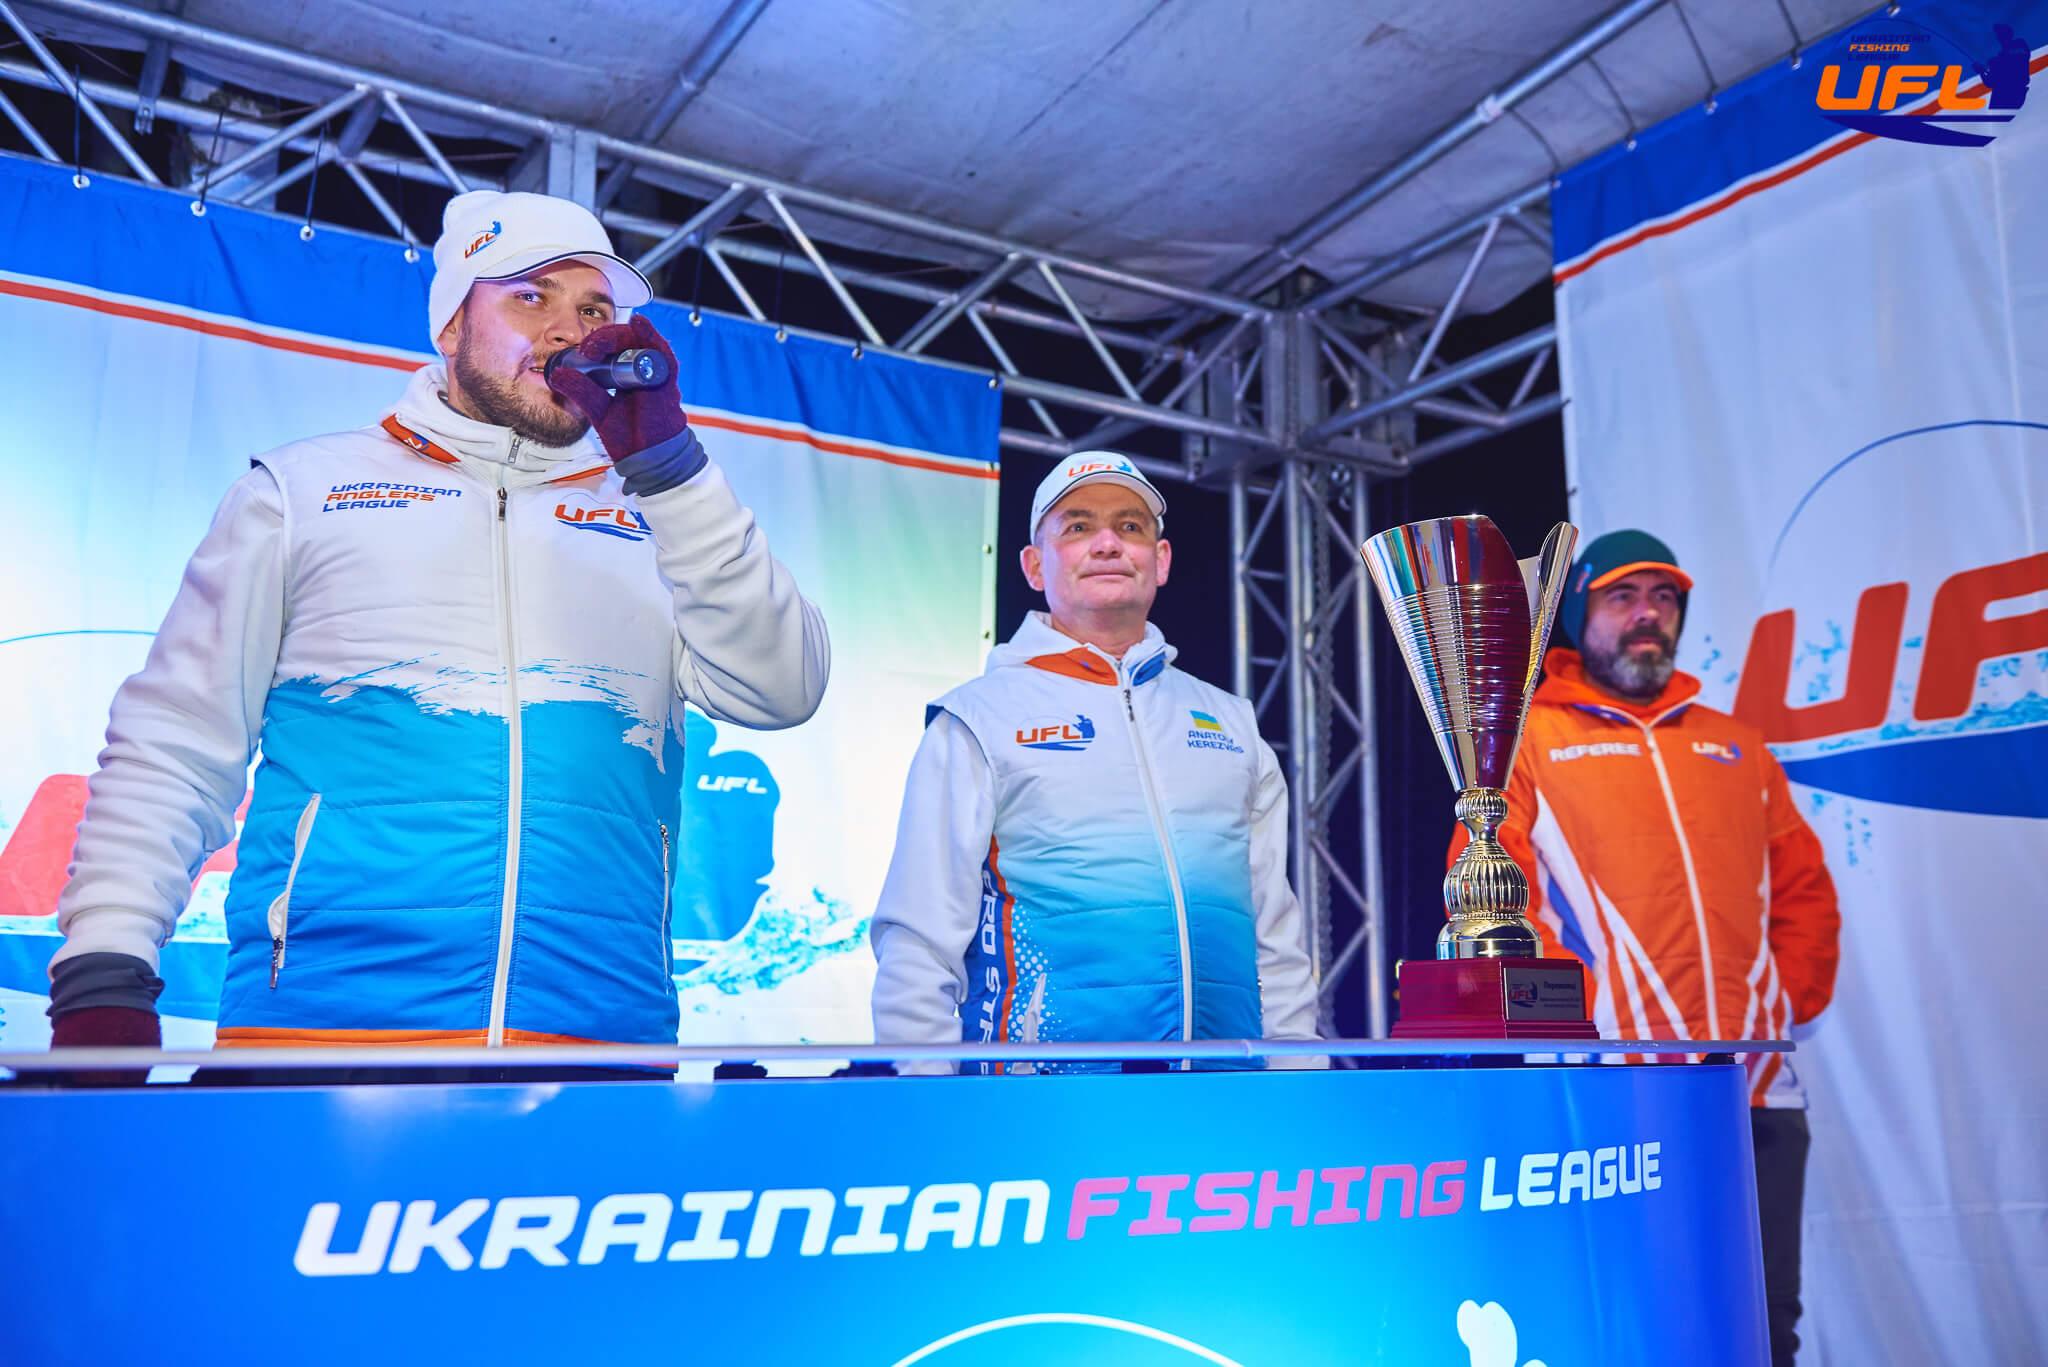 45-ofitsii-ne-vidkrittya-turniru-bezverhii-kirilo-kerezvas-anatolii-barinovas-artur